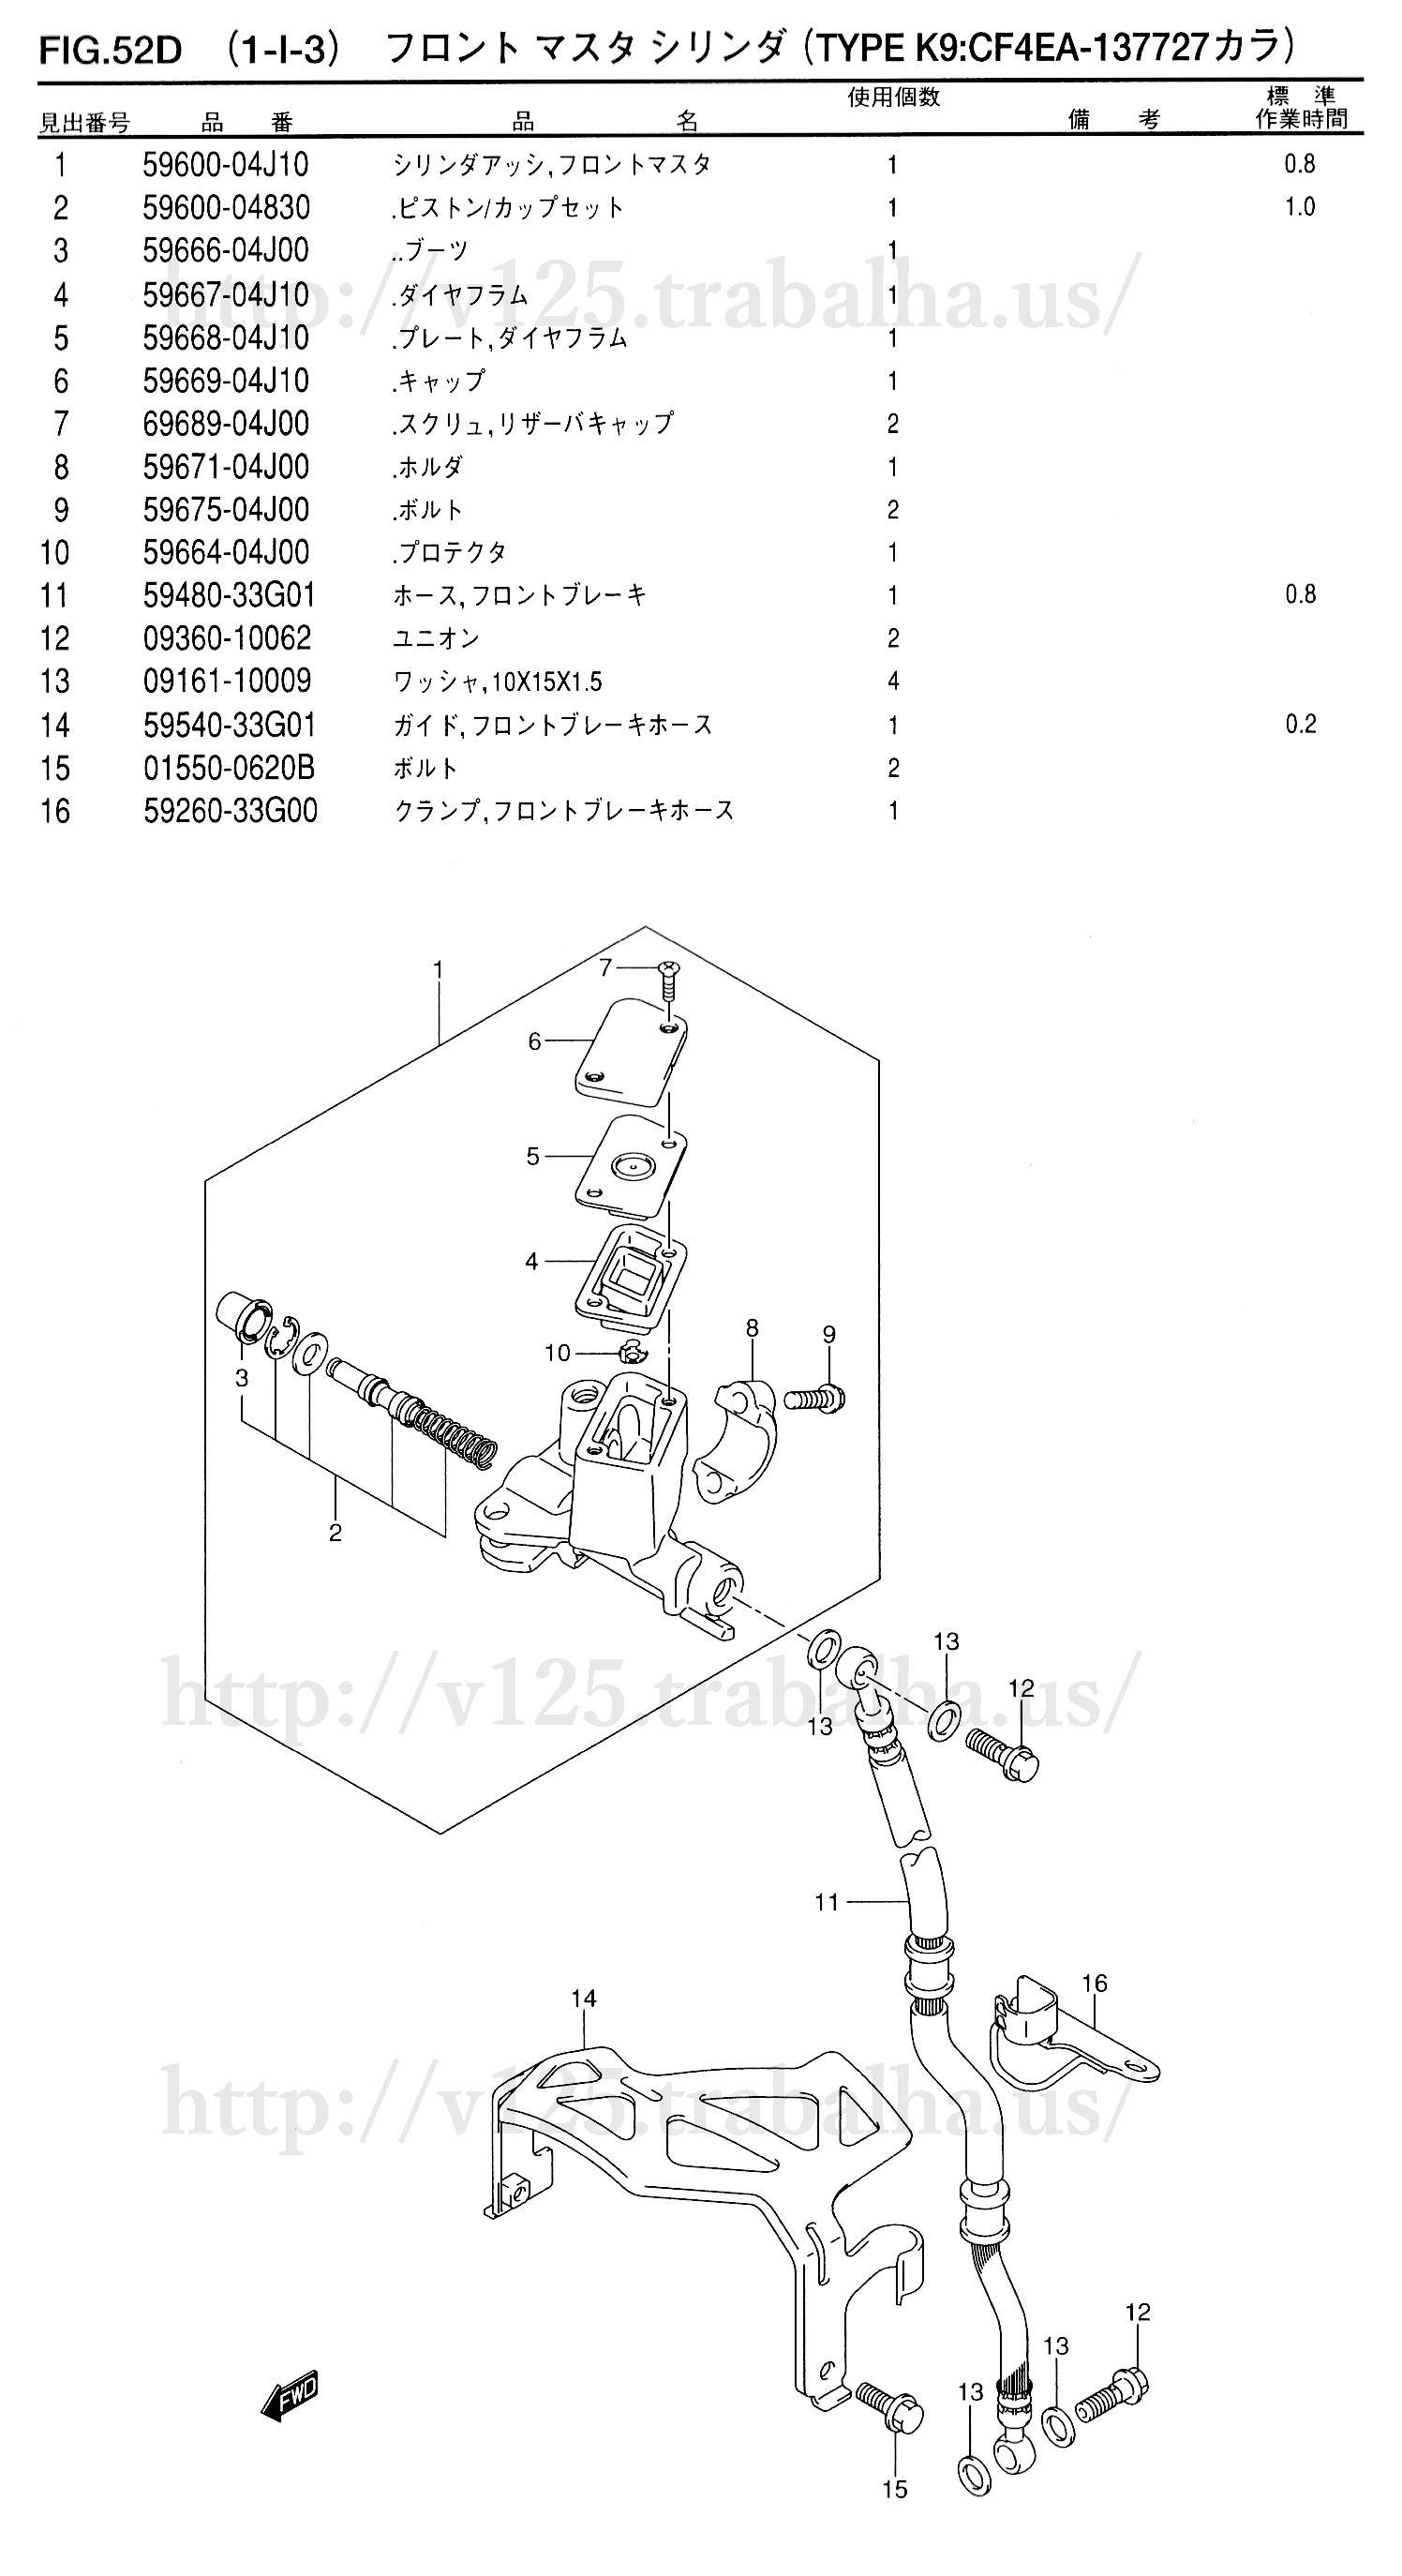 FIG.52D(1-I-3)フロント マスタ シリンダ(TYPE K9:CF4EA-137727カラ)